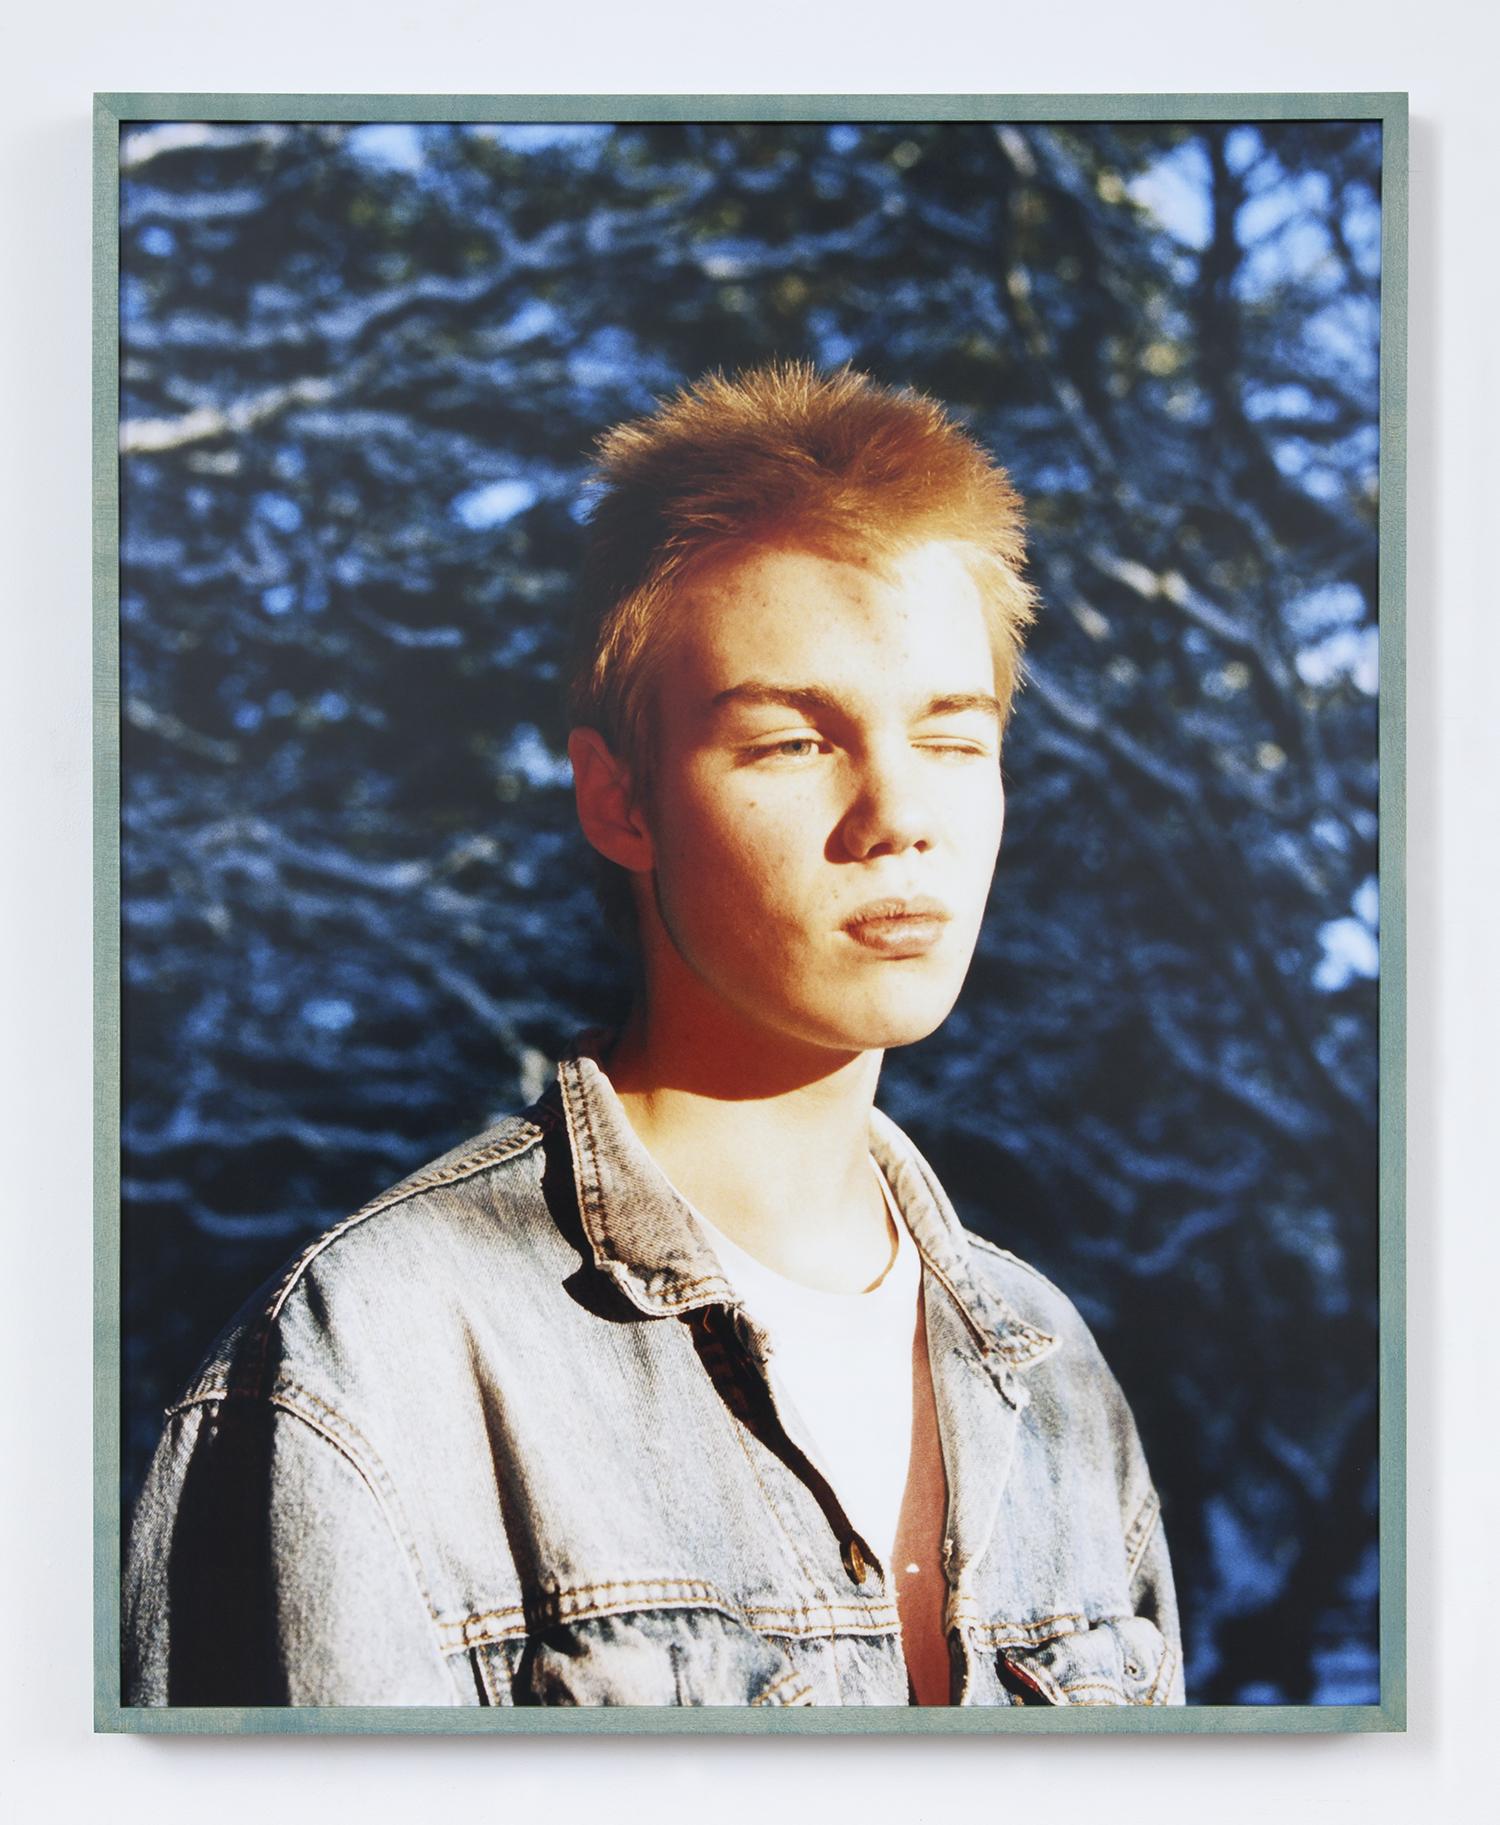 Snorri , 2018  Chromogenic Print  Manic Panic ®  Bad Boy™ Blue Stained Frame  24 x 30 Inches